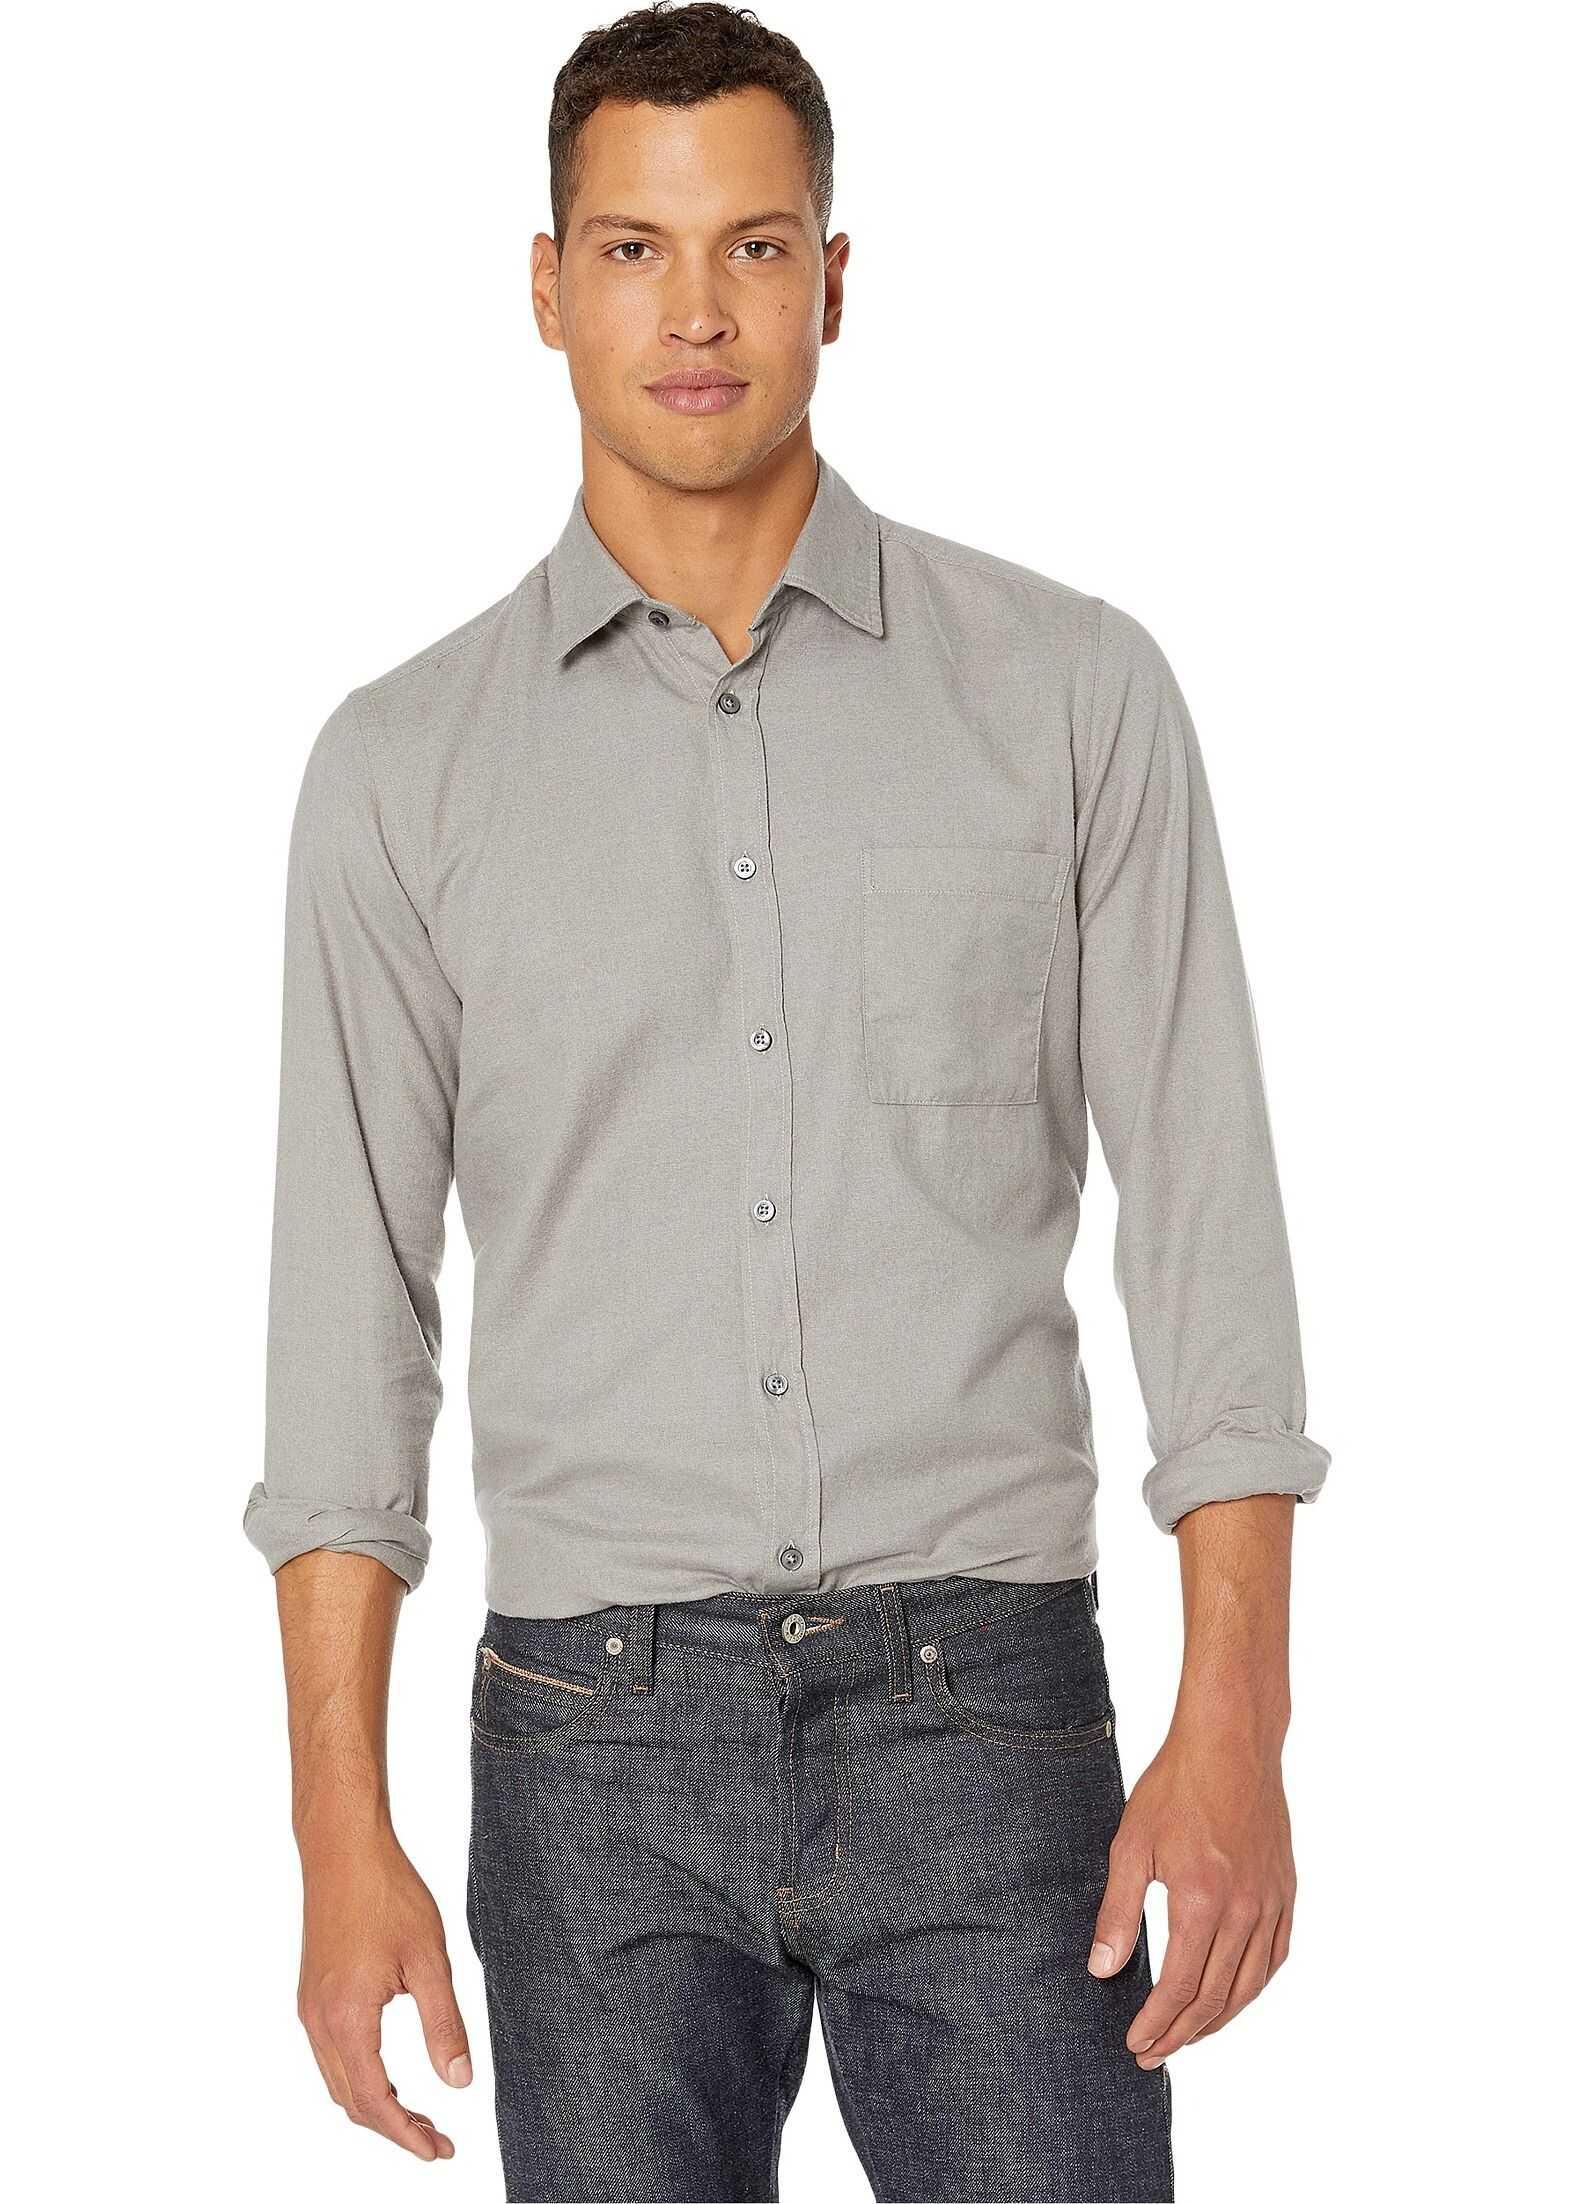 BOSS Hugo Boss Relegant_2 Shirt Medium Grey